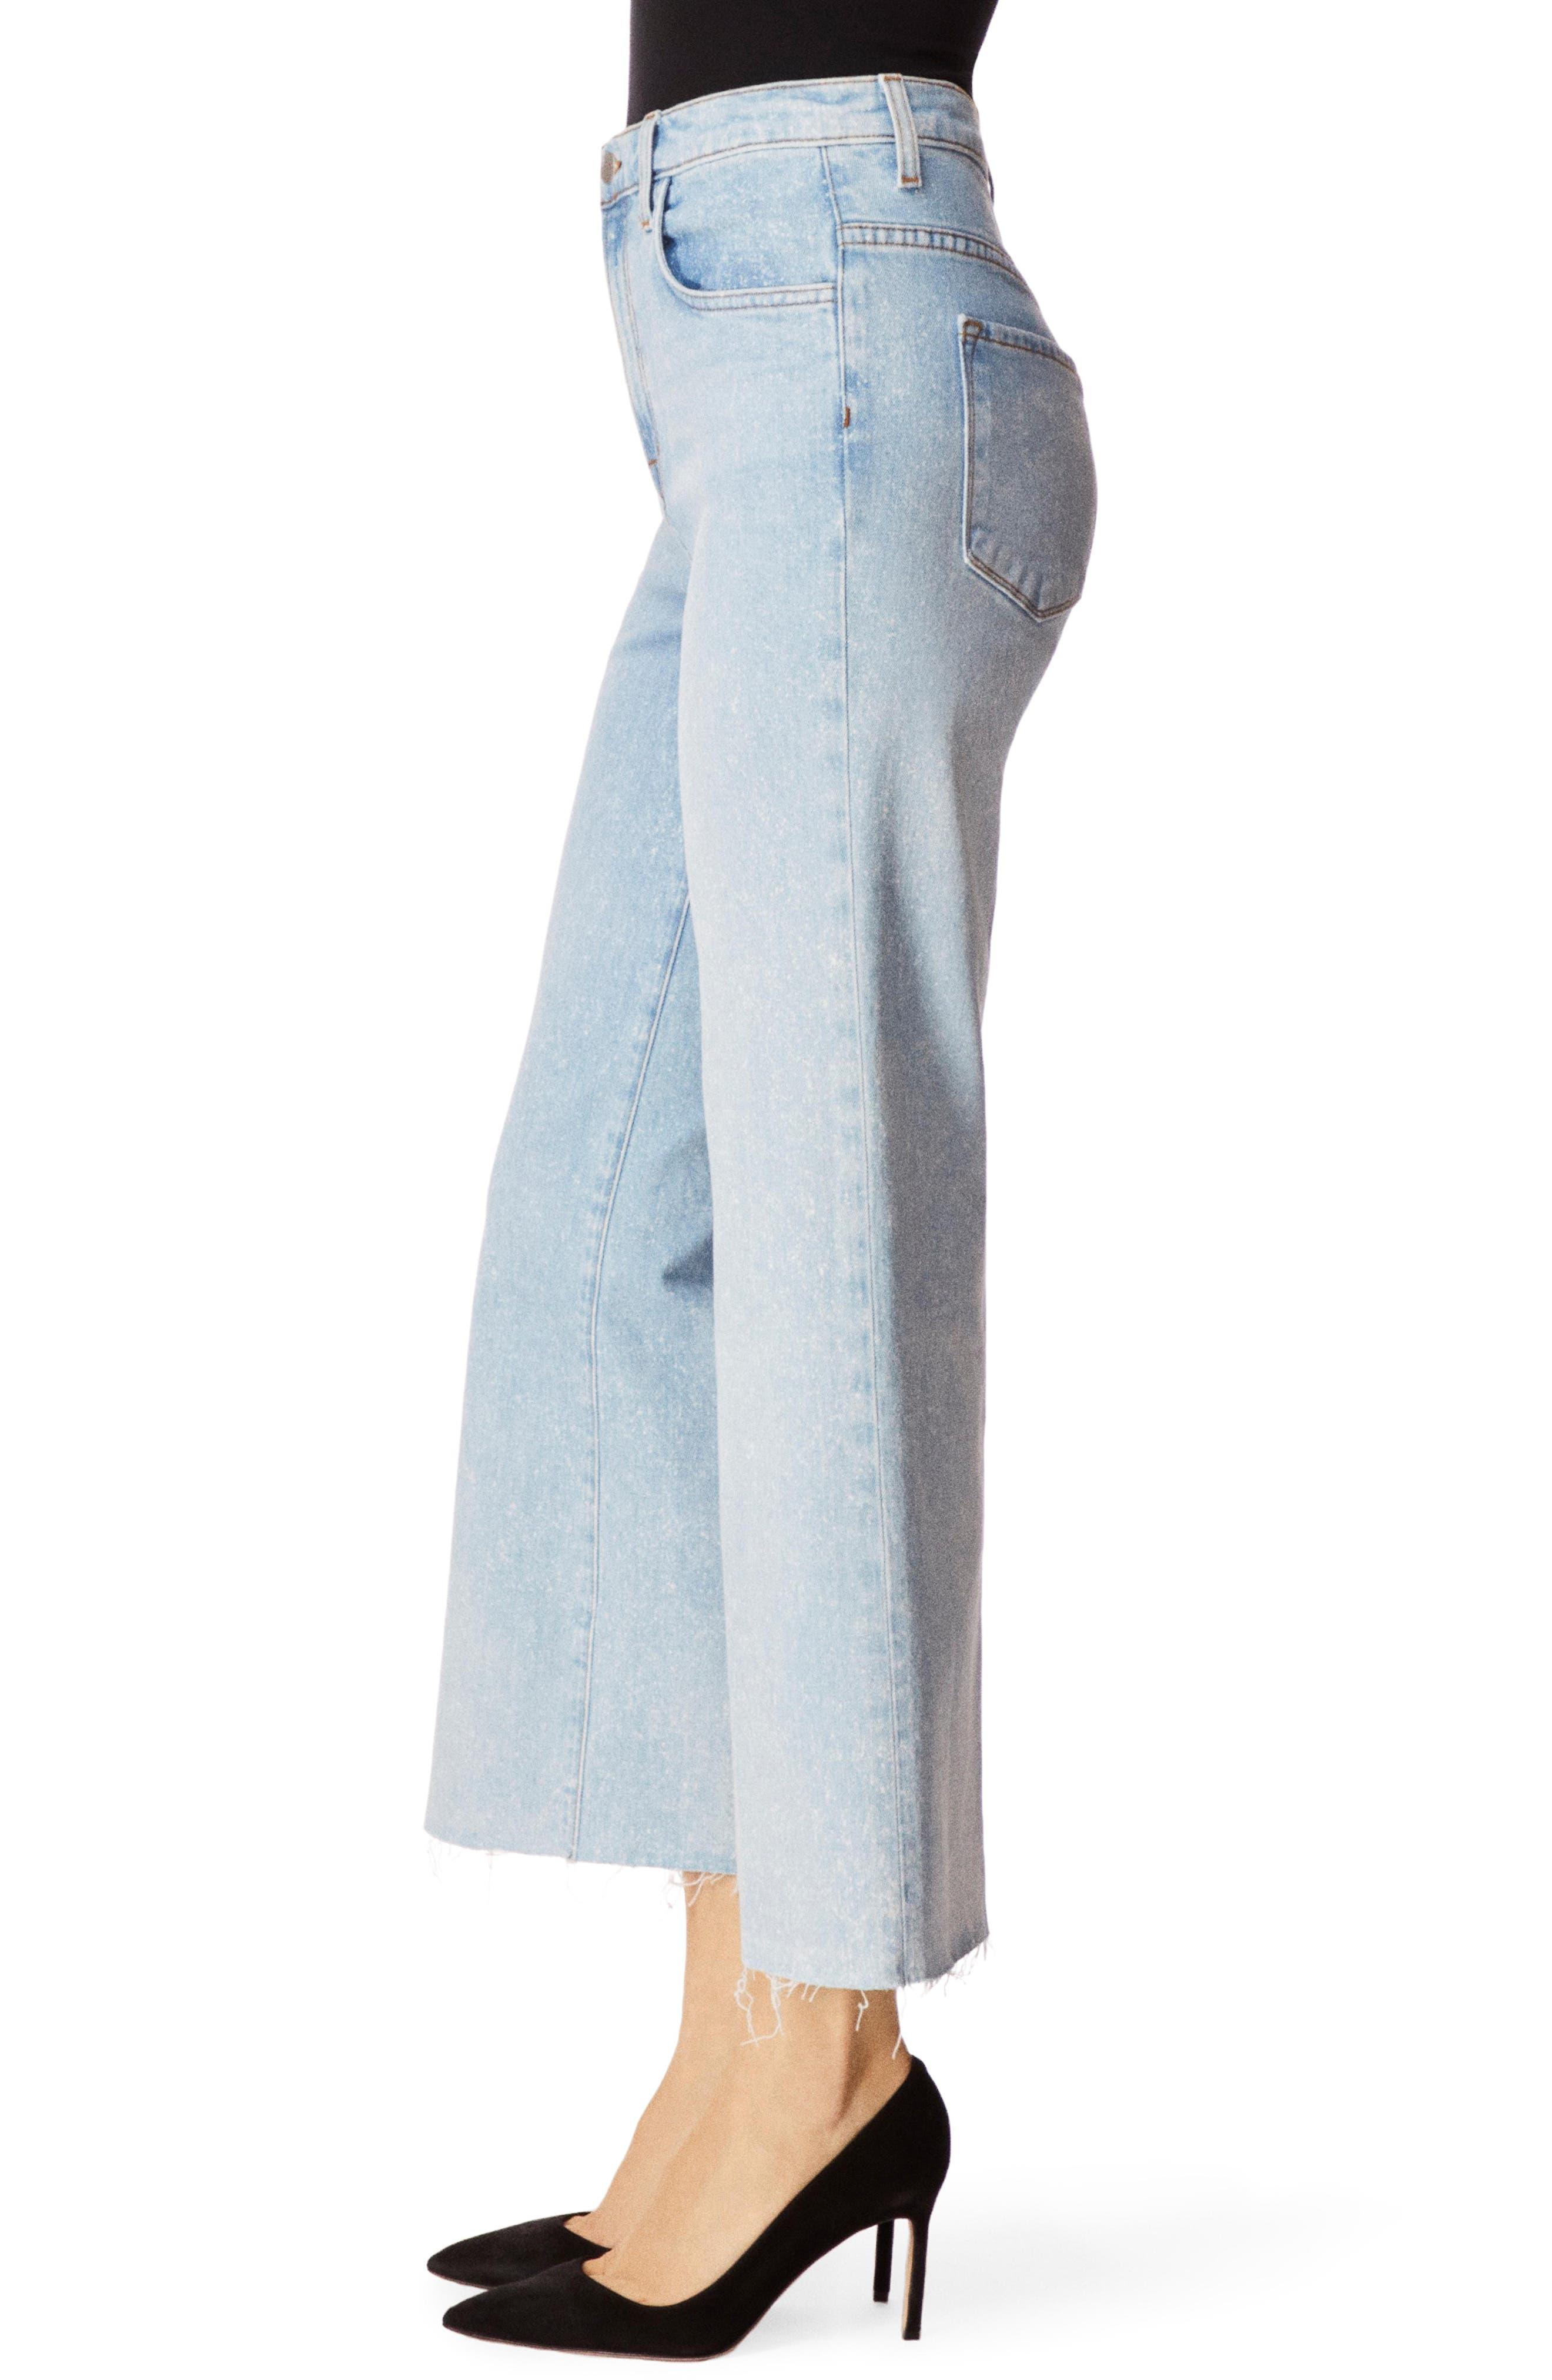 J BRAND, Joan High Waist Crop Wide Leg Jeans, Alternate thumbnail 3, color, AERGLO